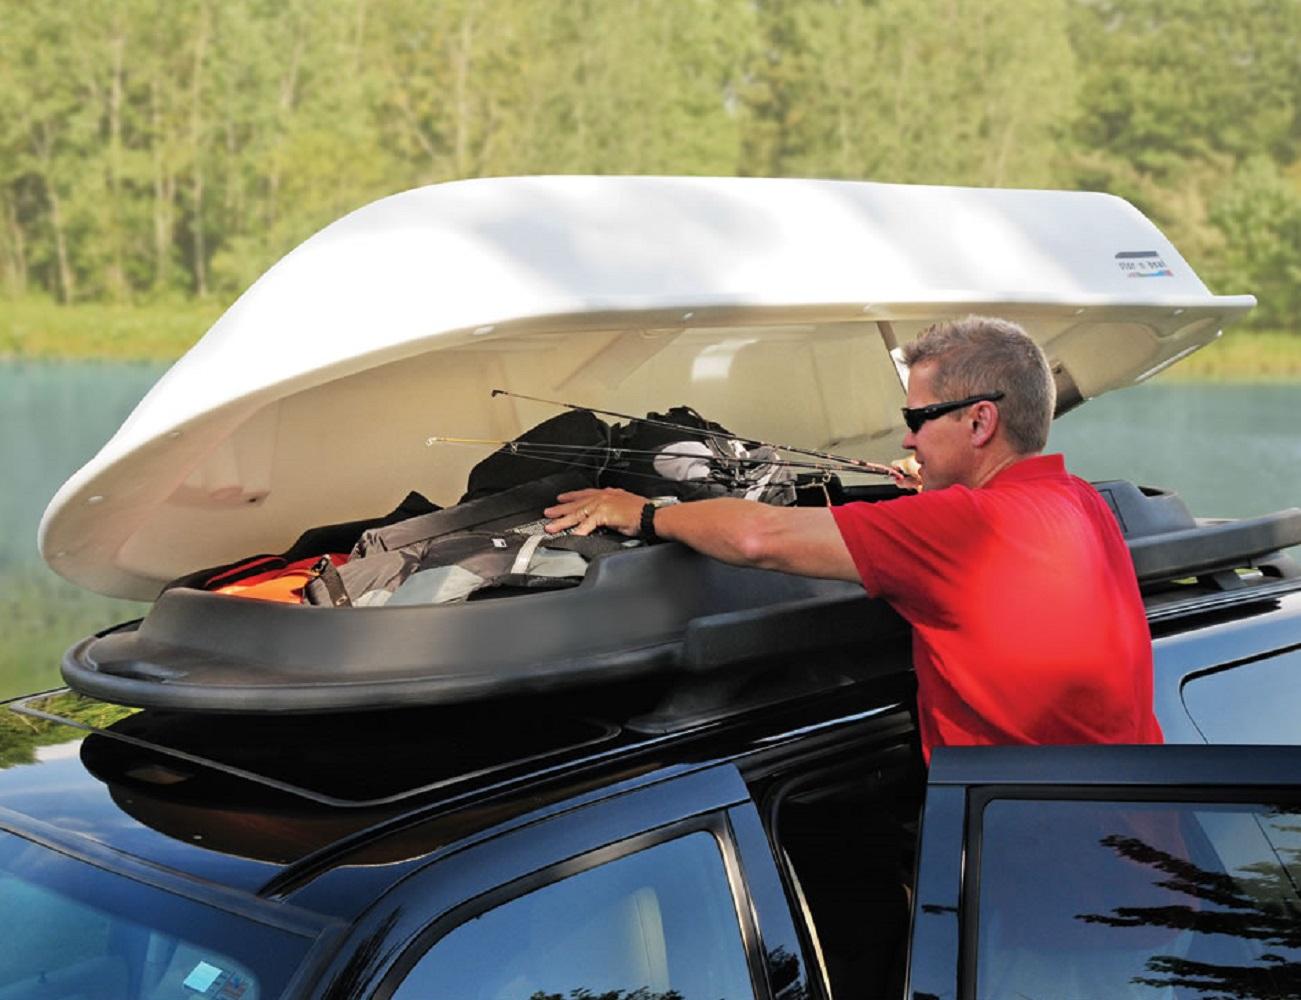 Rooftop Cargo Carrier Rental >> Car Top Carrier Dinghy » Gadget Flow